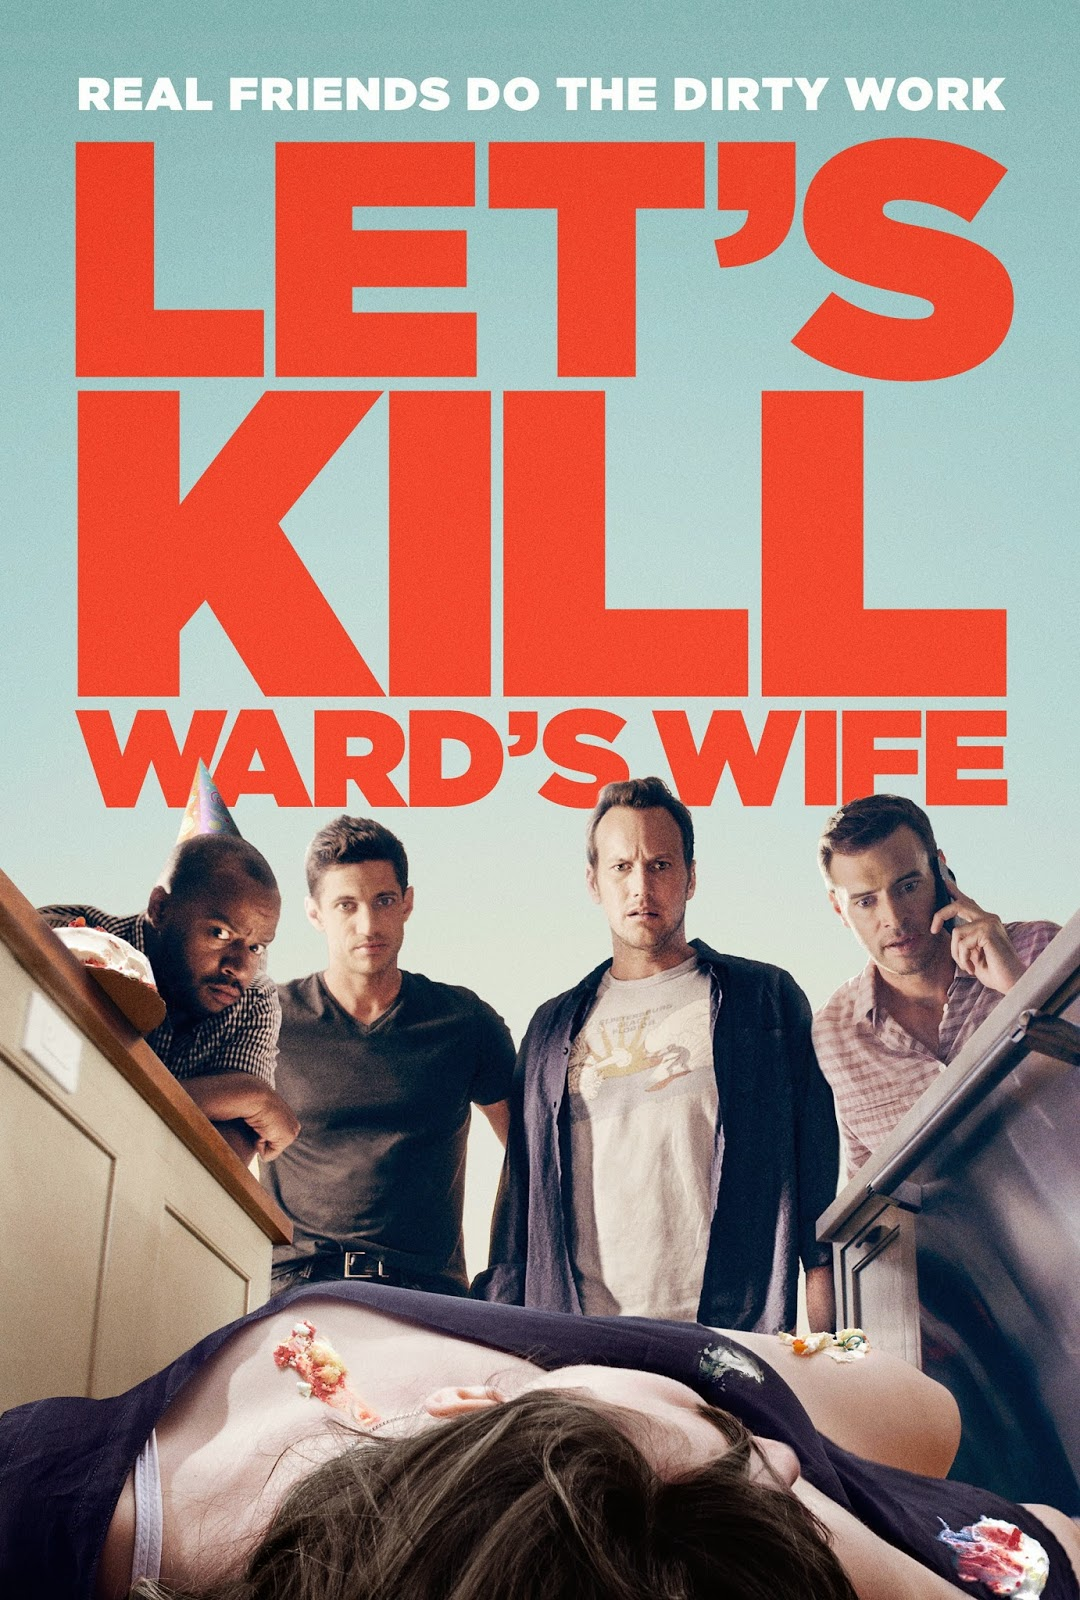 Let's Kill Ward's Wife (2014) HDRip ταινιες online seires xrysoi greek subs